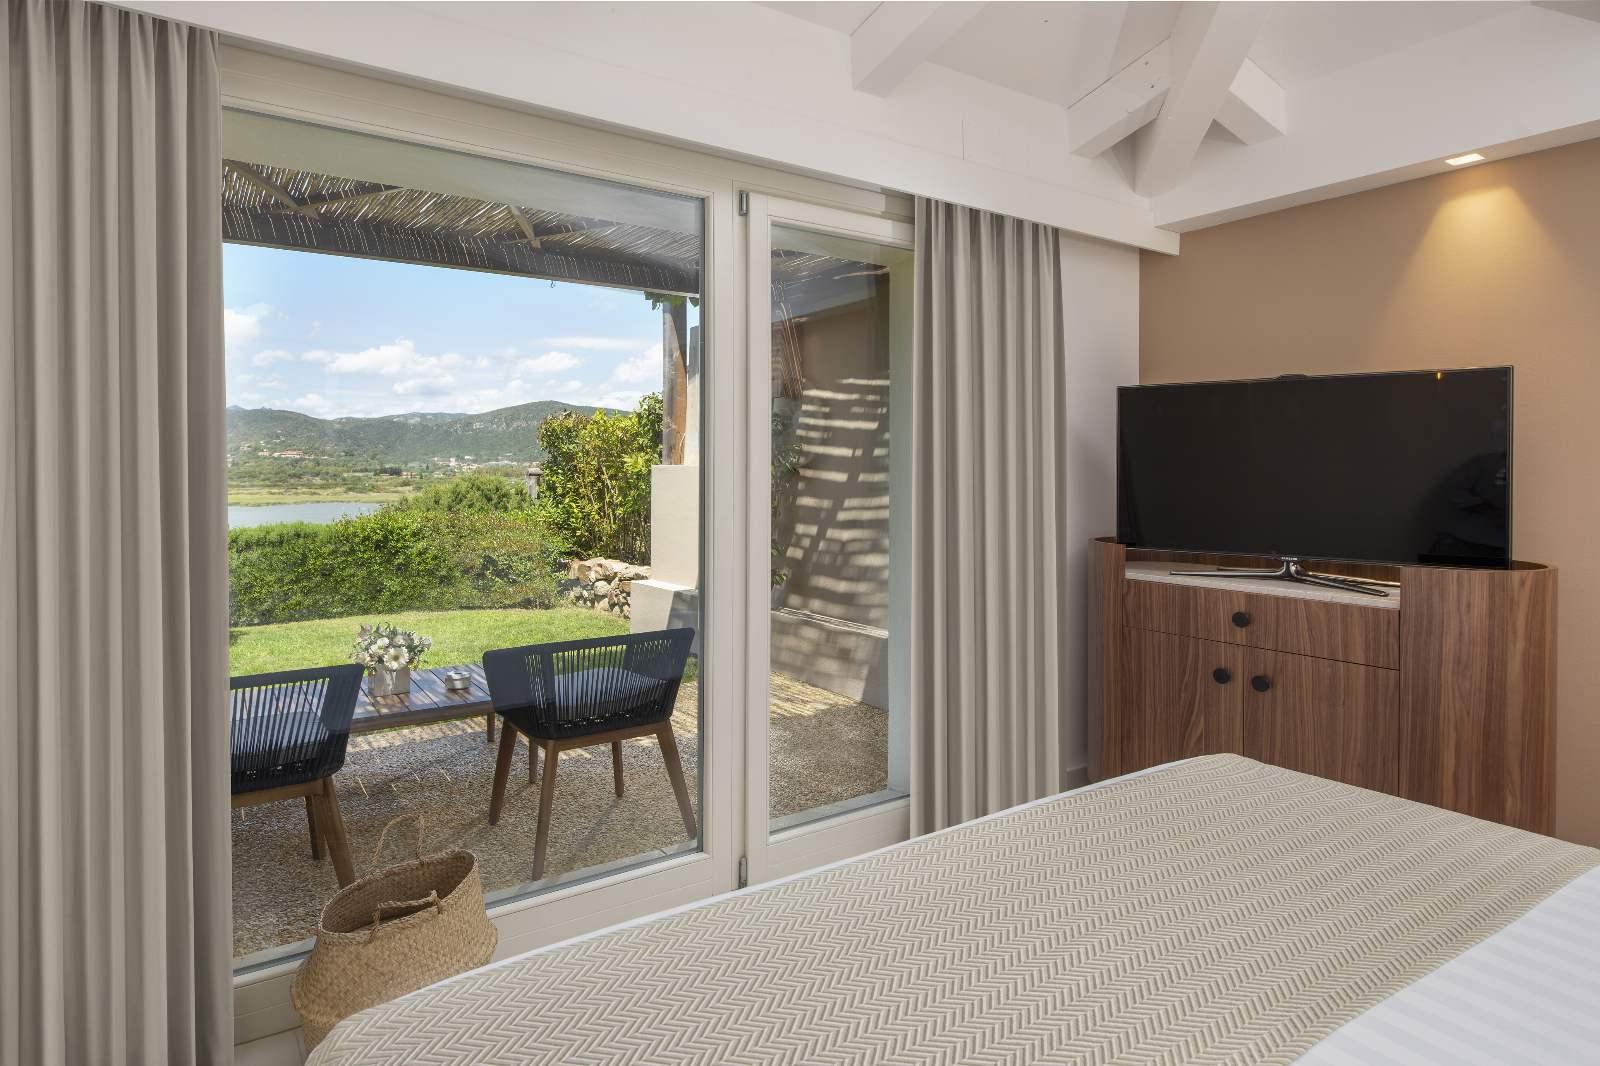 Baia Di Chia Resort King Deluxe Room with Lagoon View